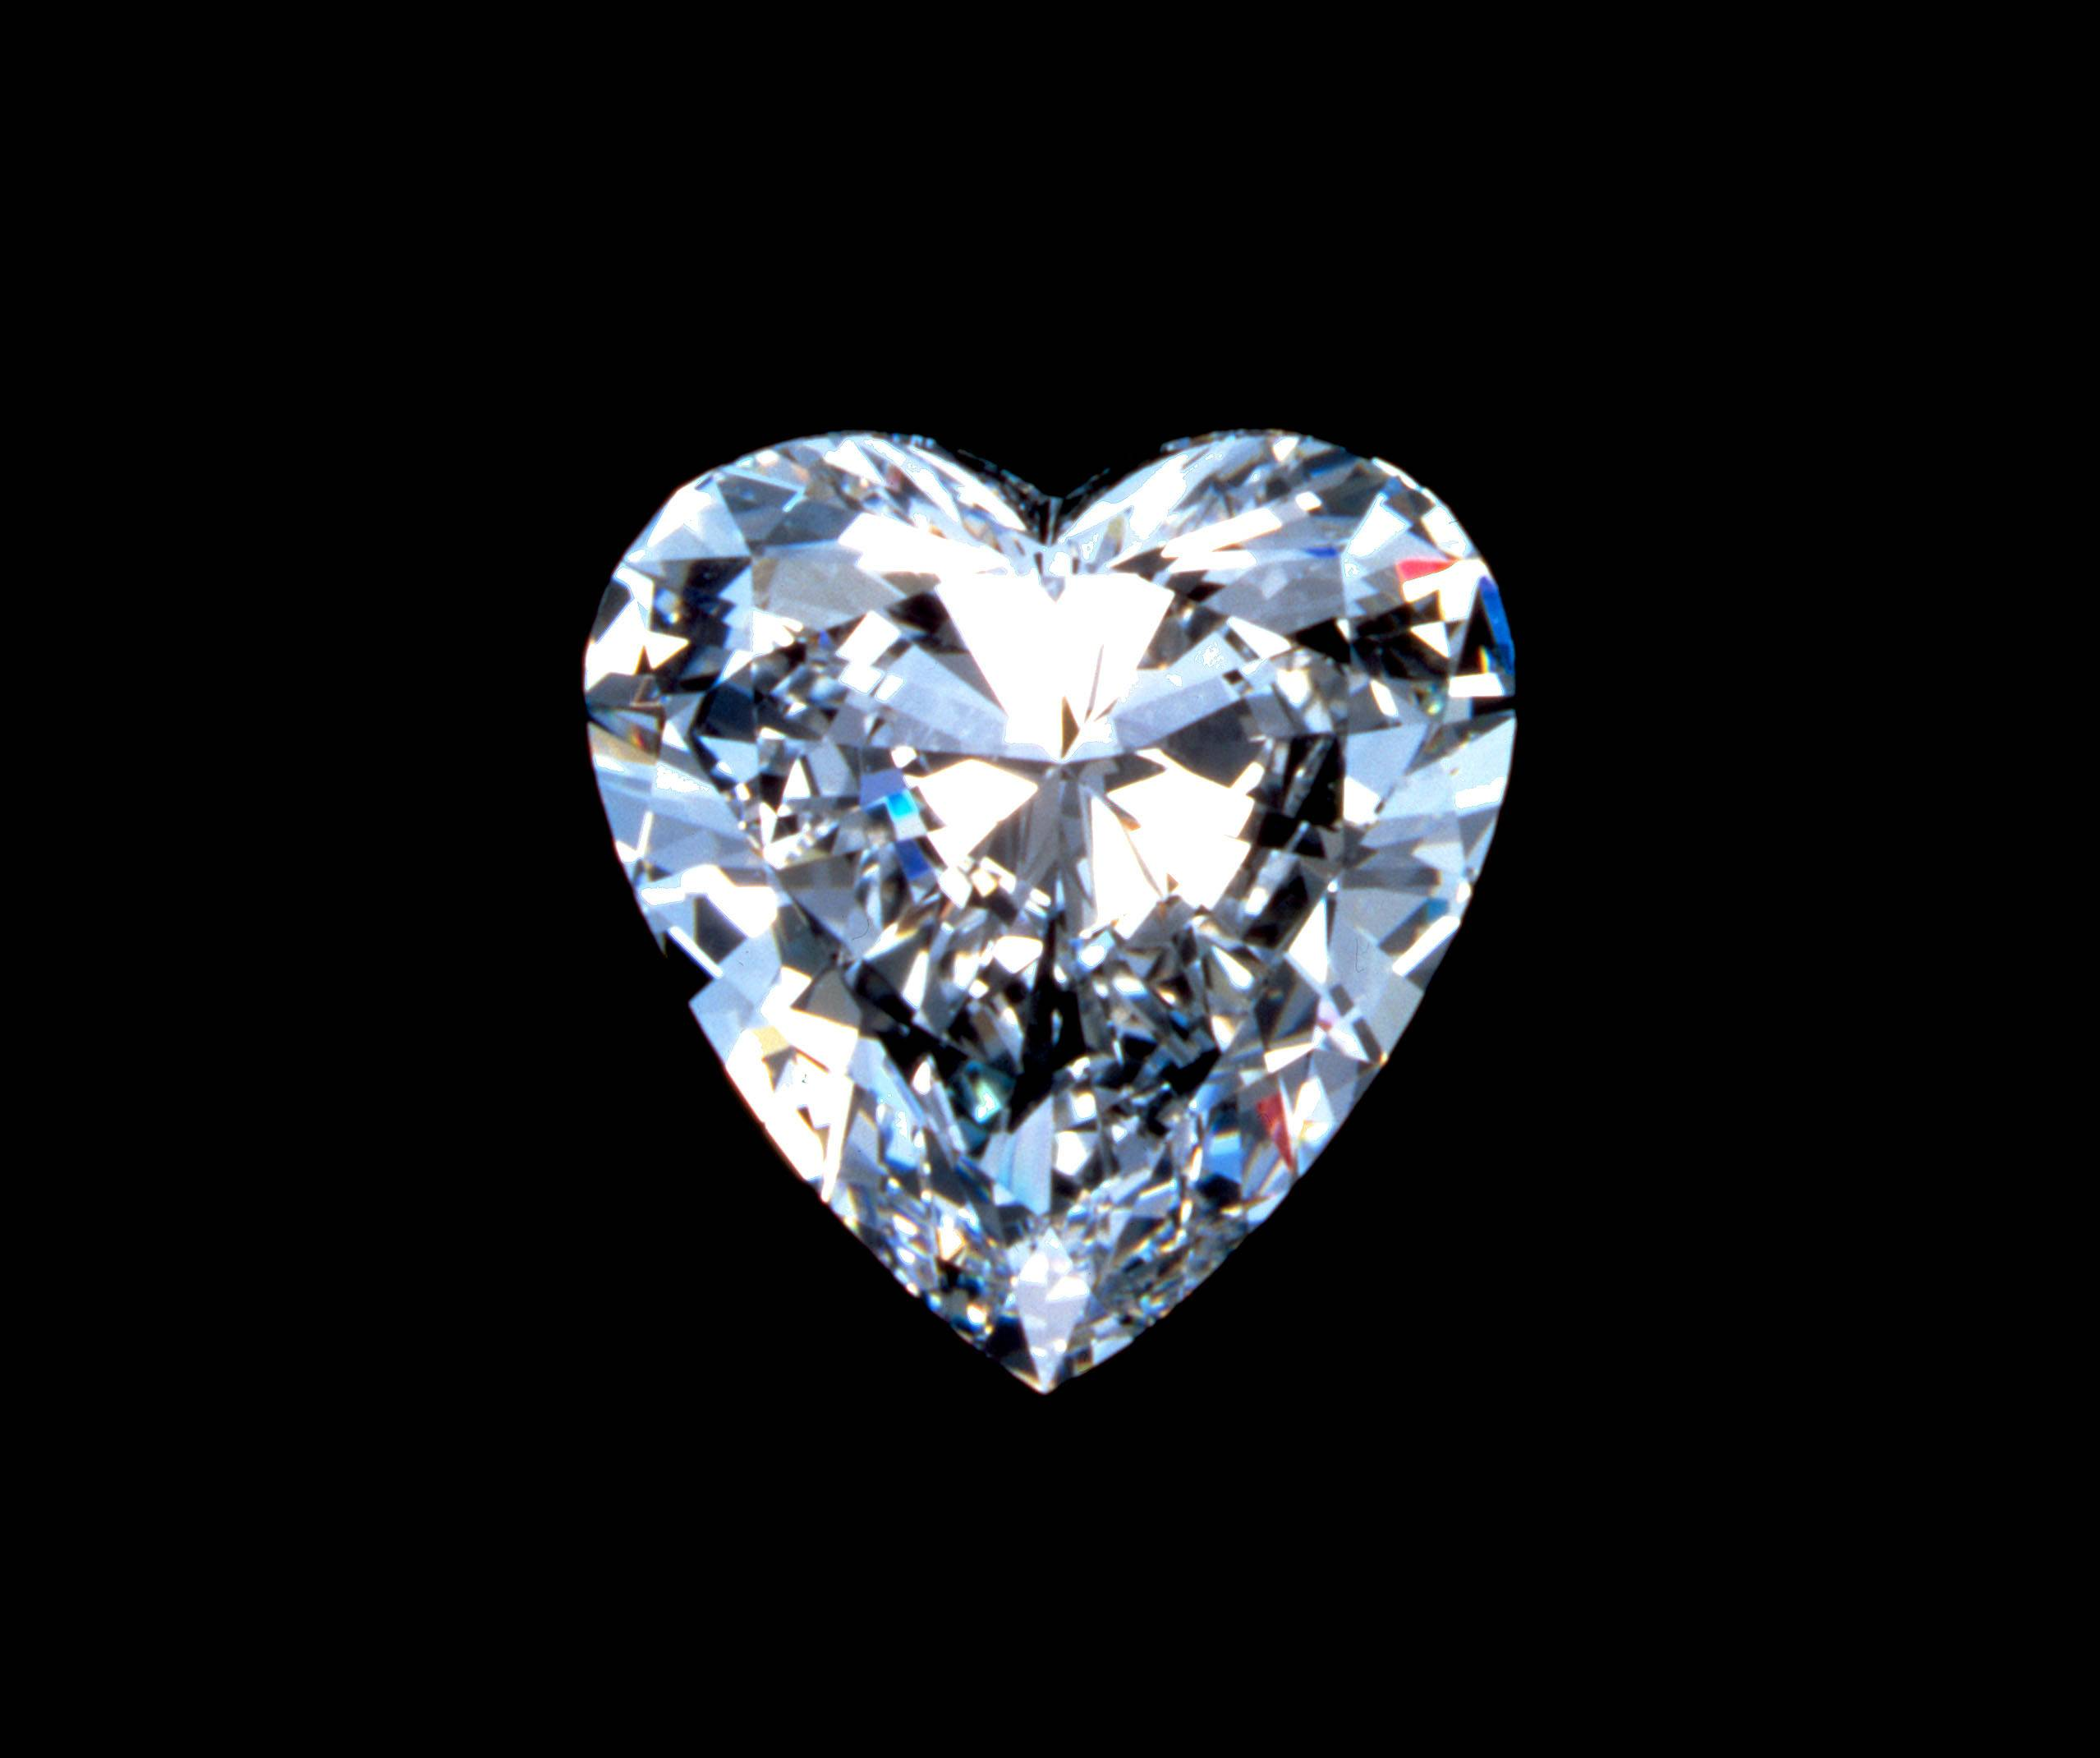 Heart Shaped Diamond   diamonds Picture 2557x2140